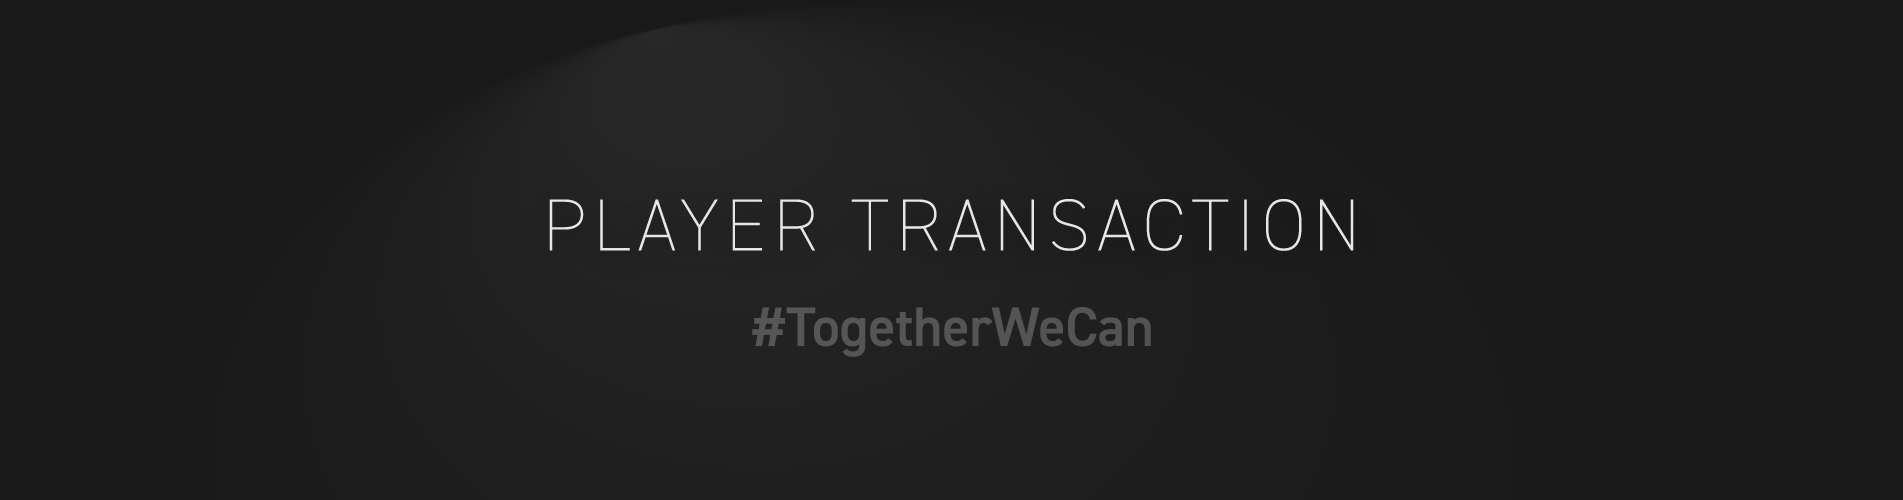 Player-transaction